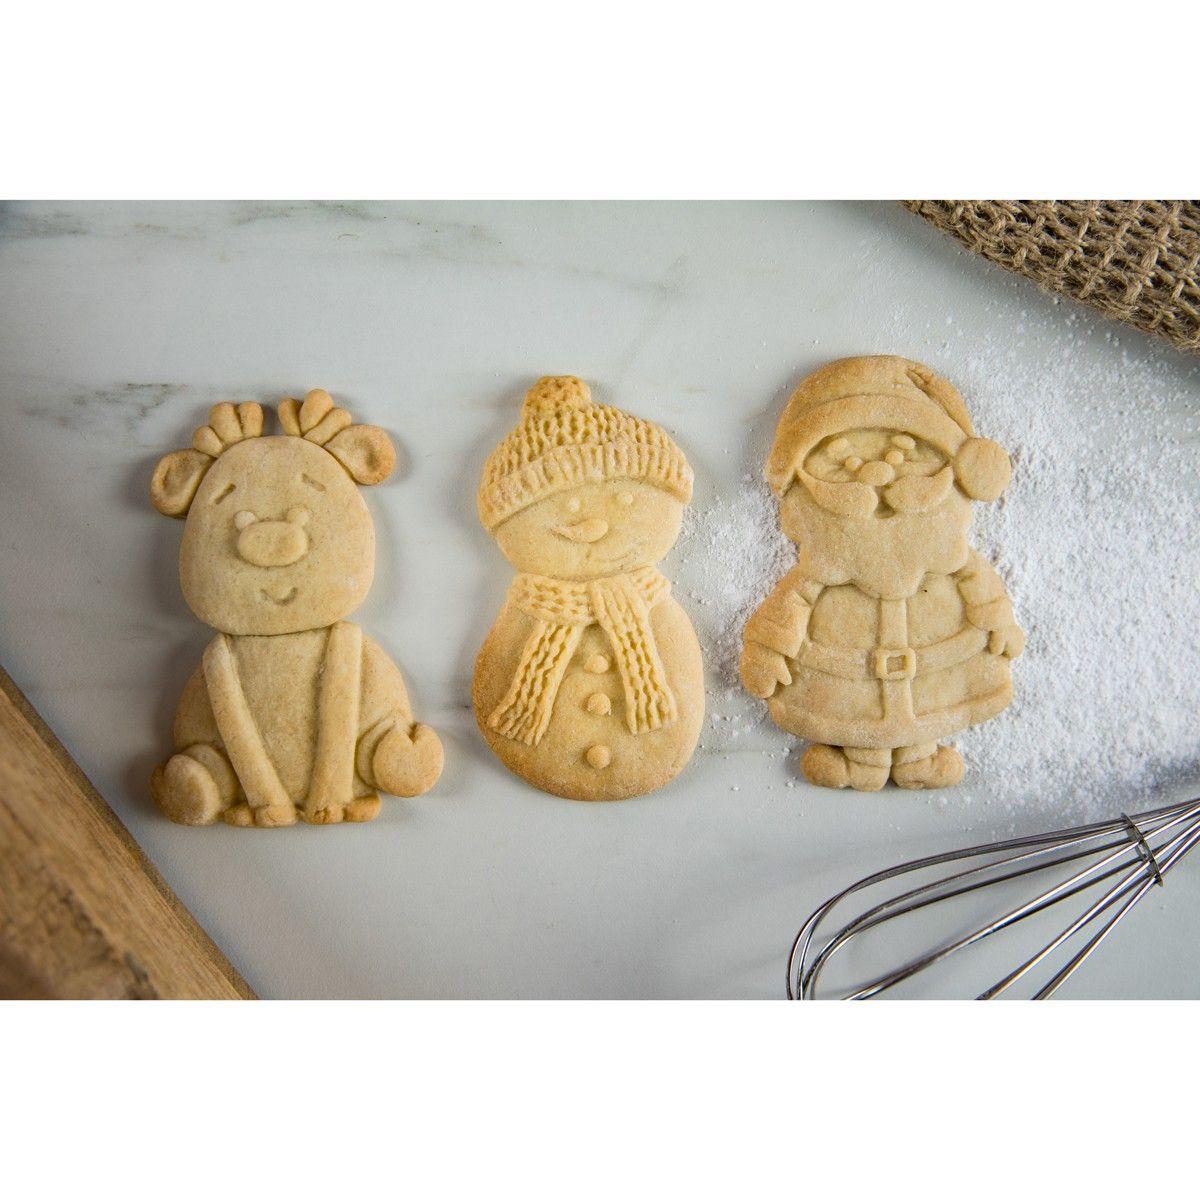 Silikonform Karen Davies | Christmas Cookie